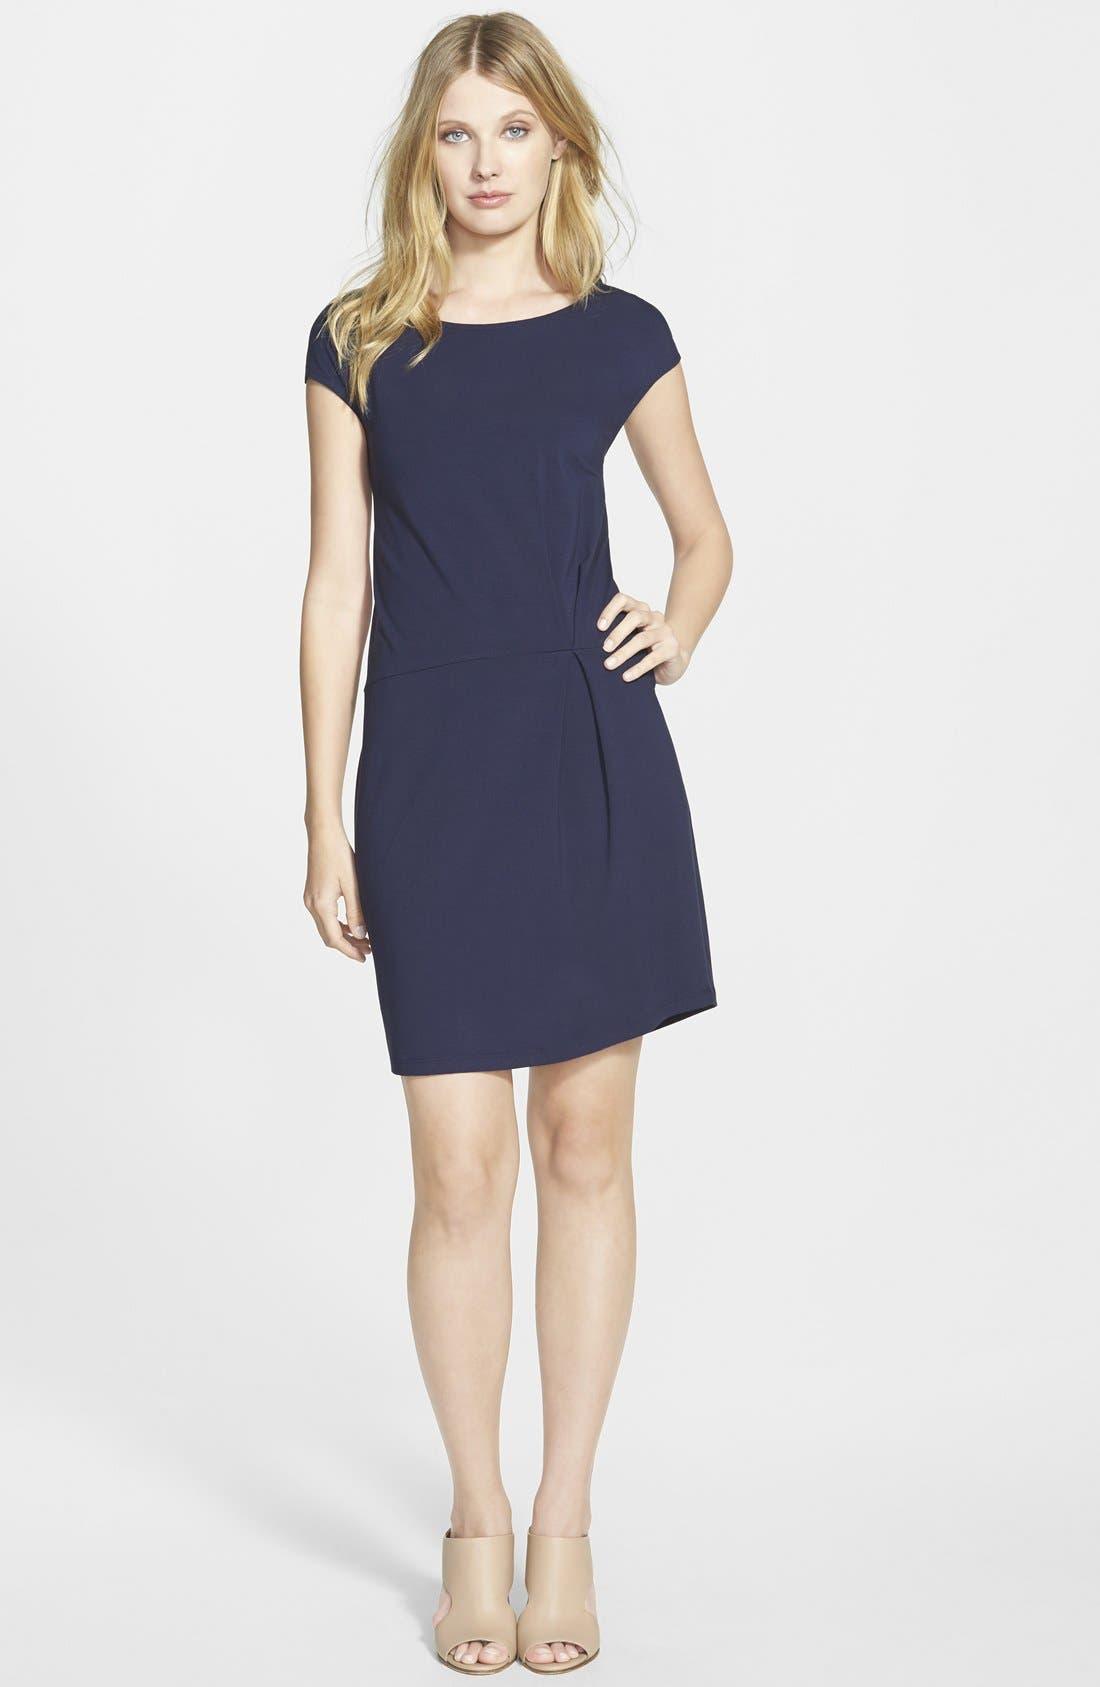 Alternate Image 1 Selected - Eileen Fisher Wide Neck Jersey Shift Dress (Regular & Petite) (Online Only)